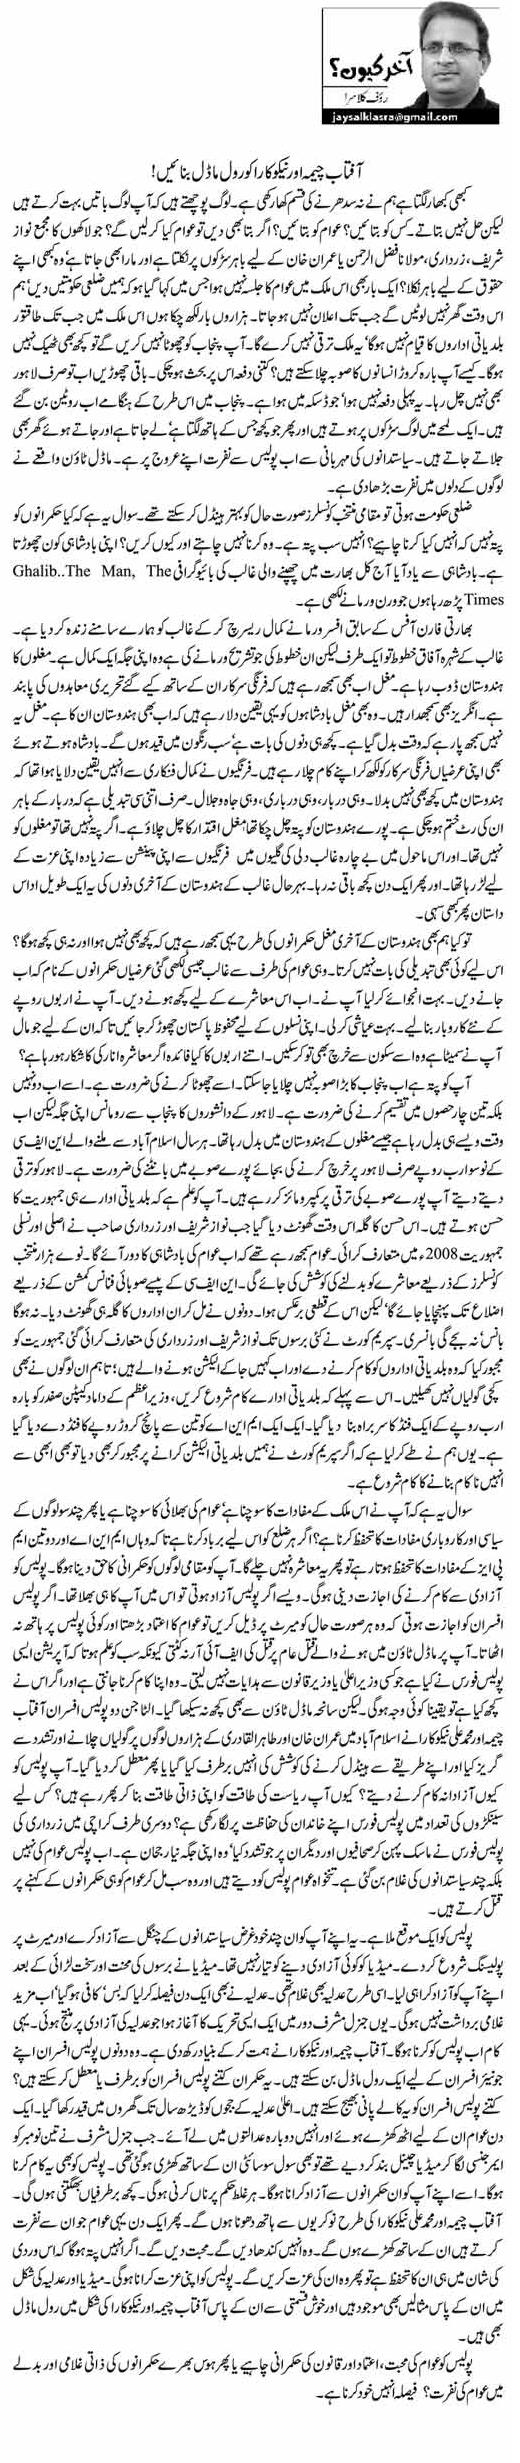 Aftab Cheema Aur Nekokara Ko Role Model Banaien By Rauf Klasra Pakfunny